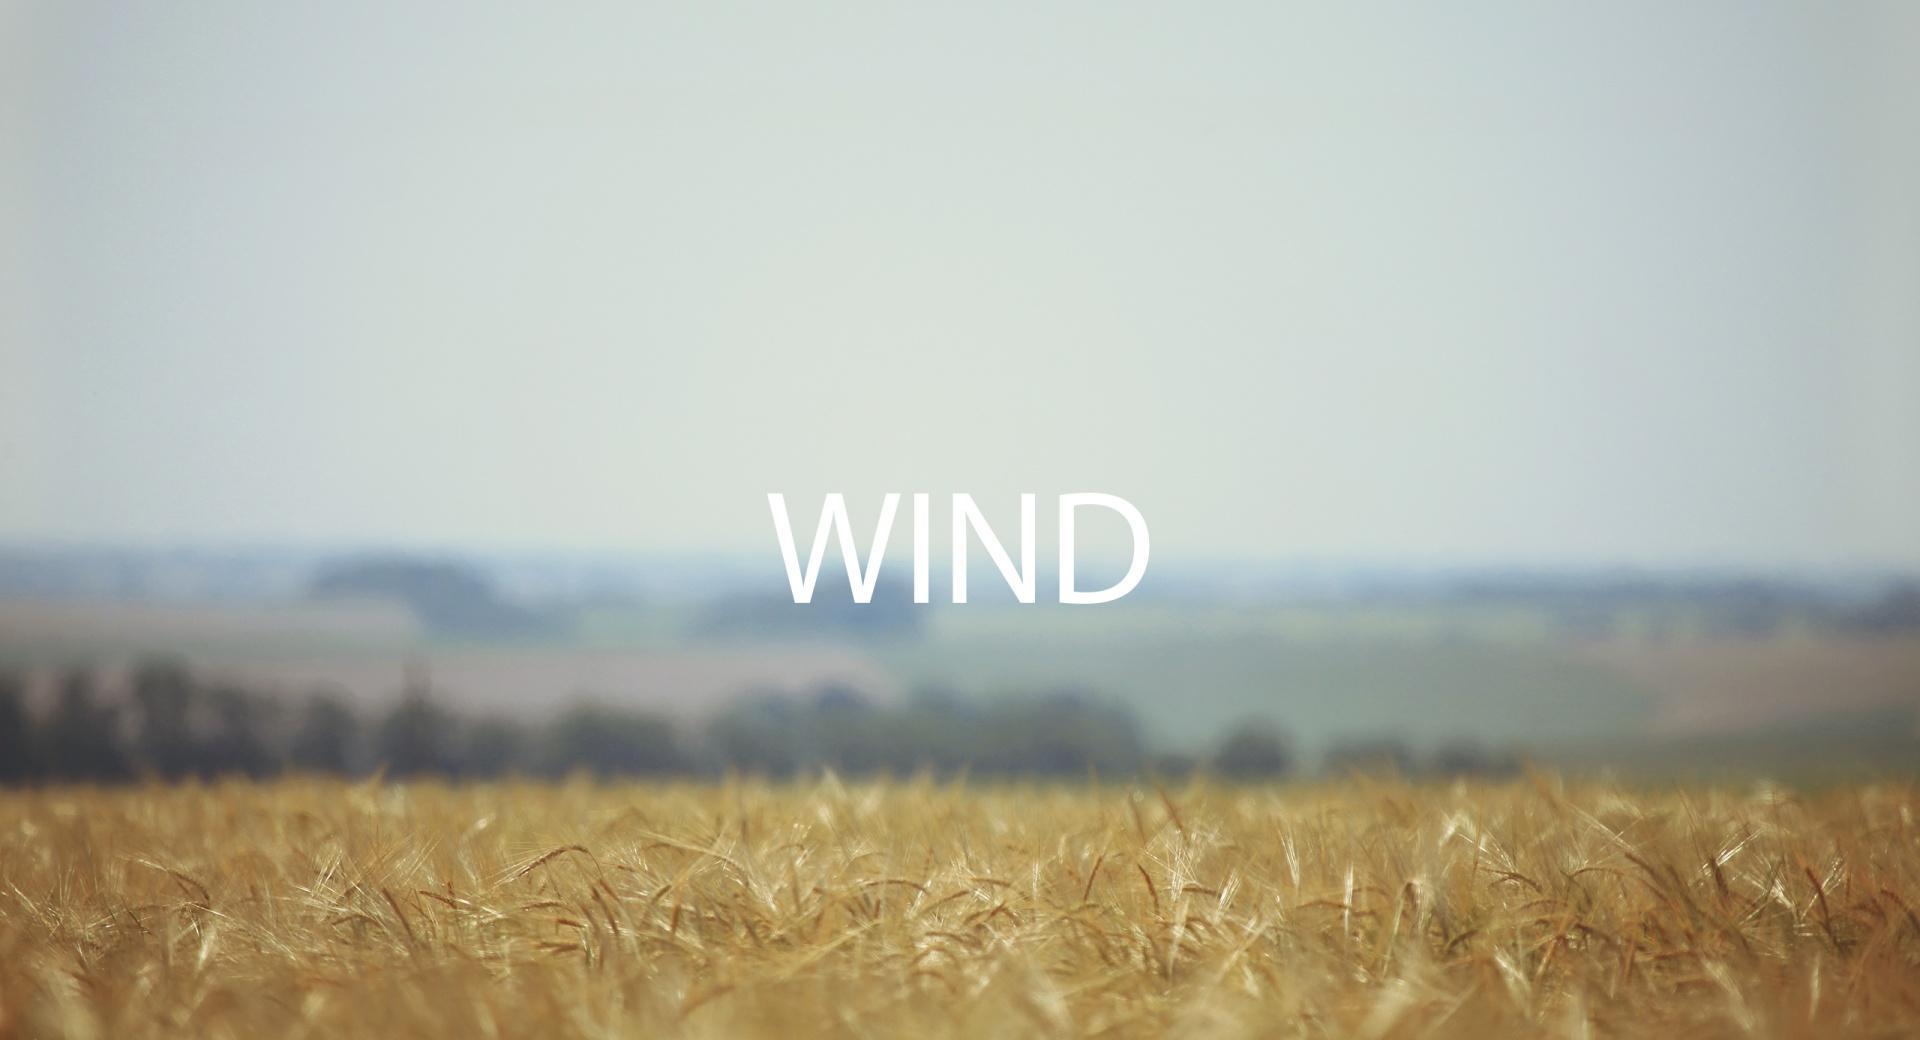 Field Wind wallpapers HD quality